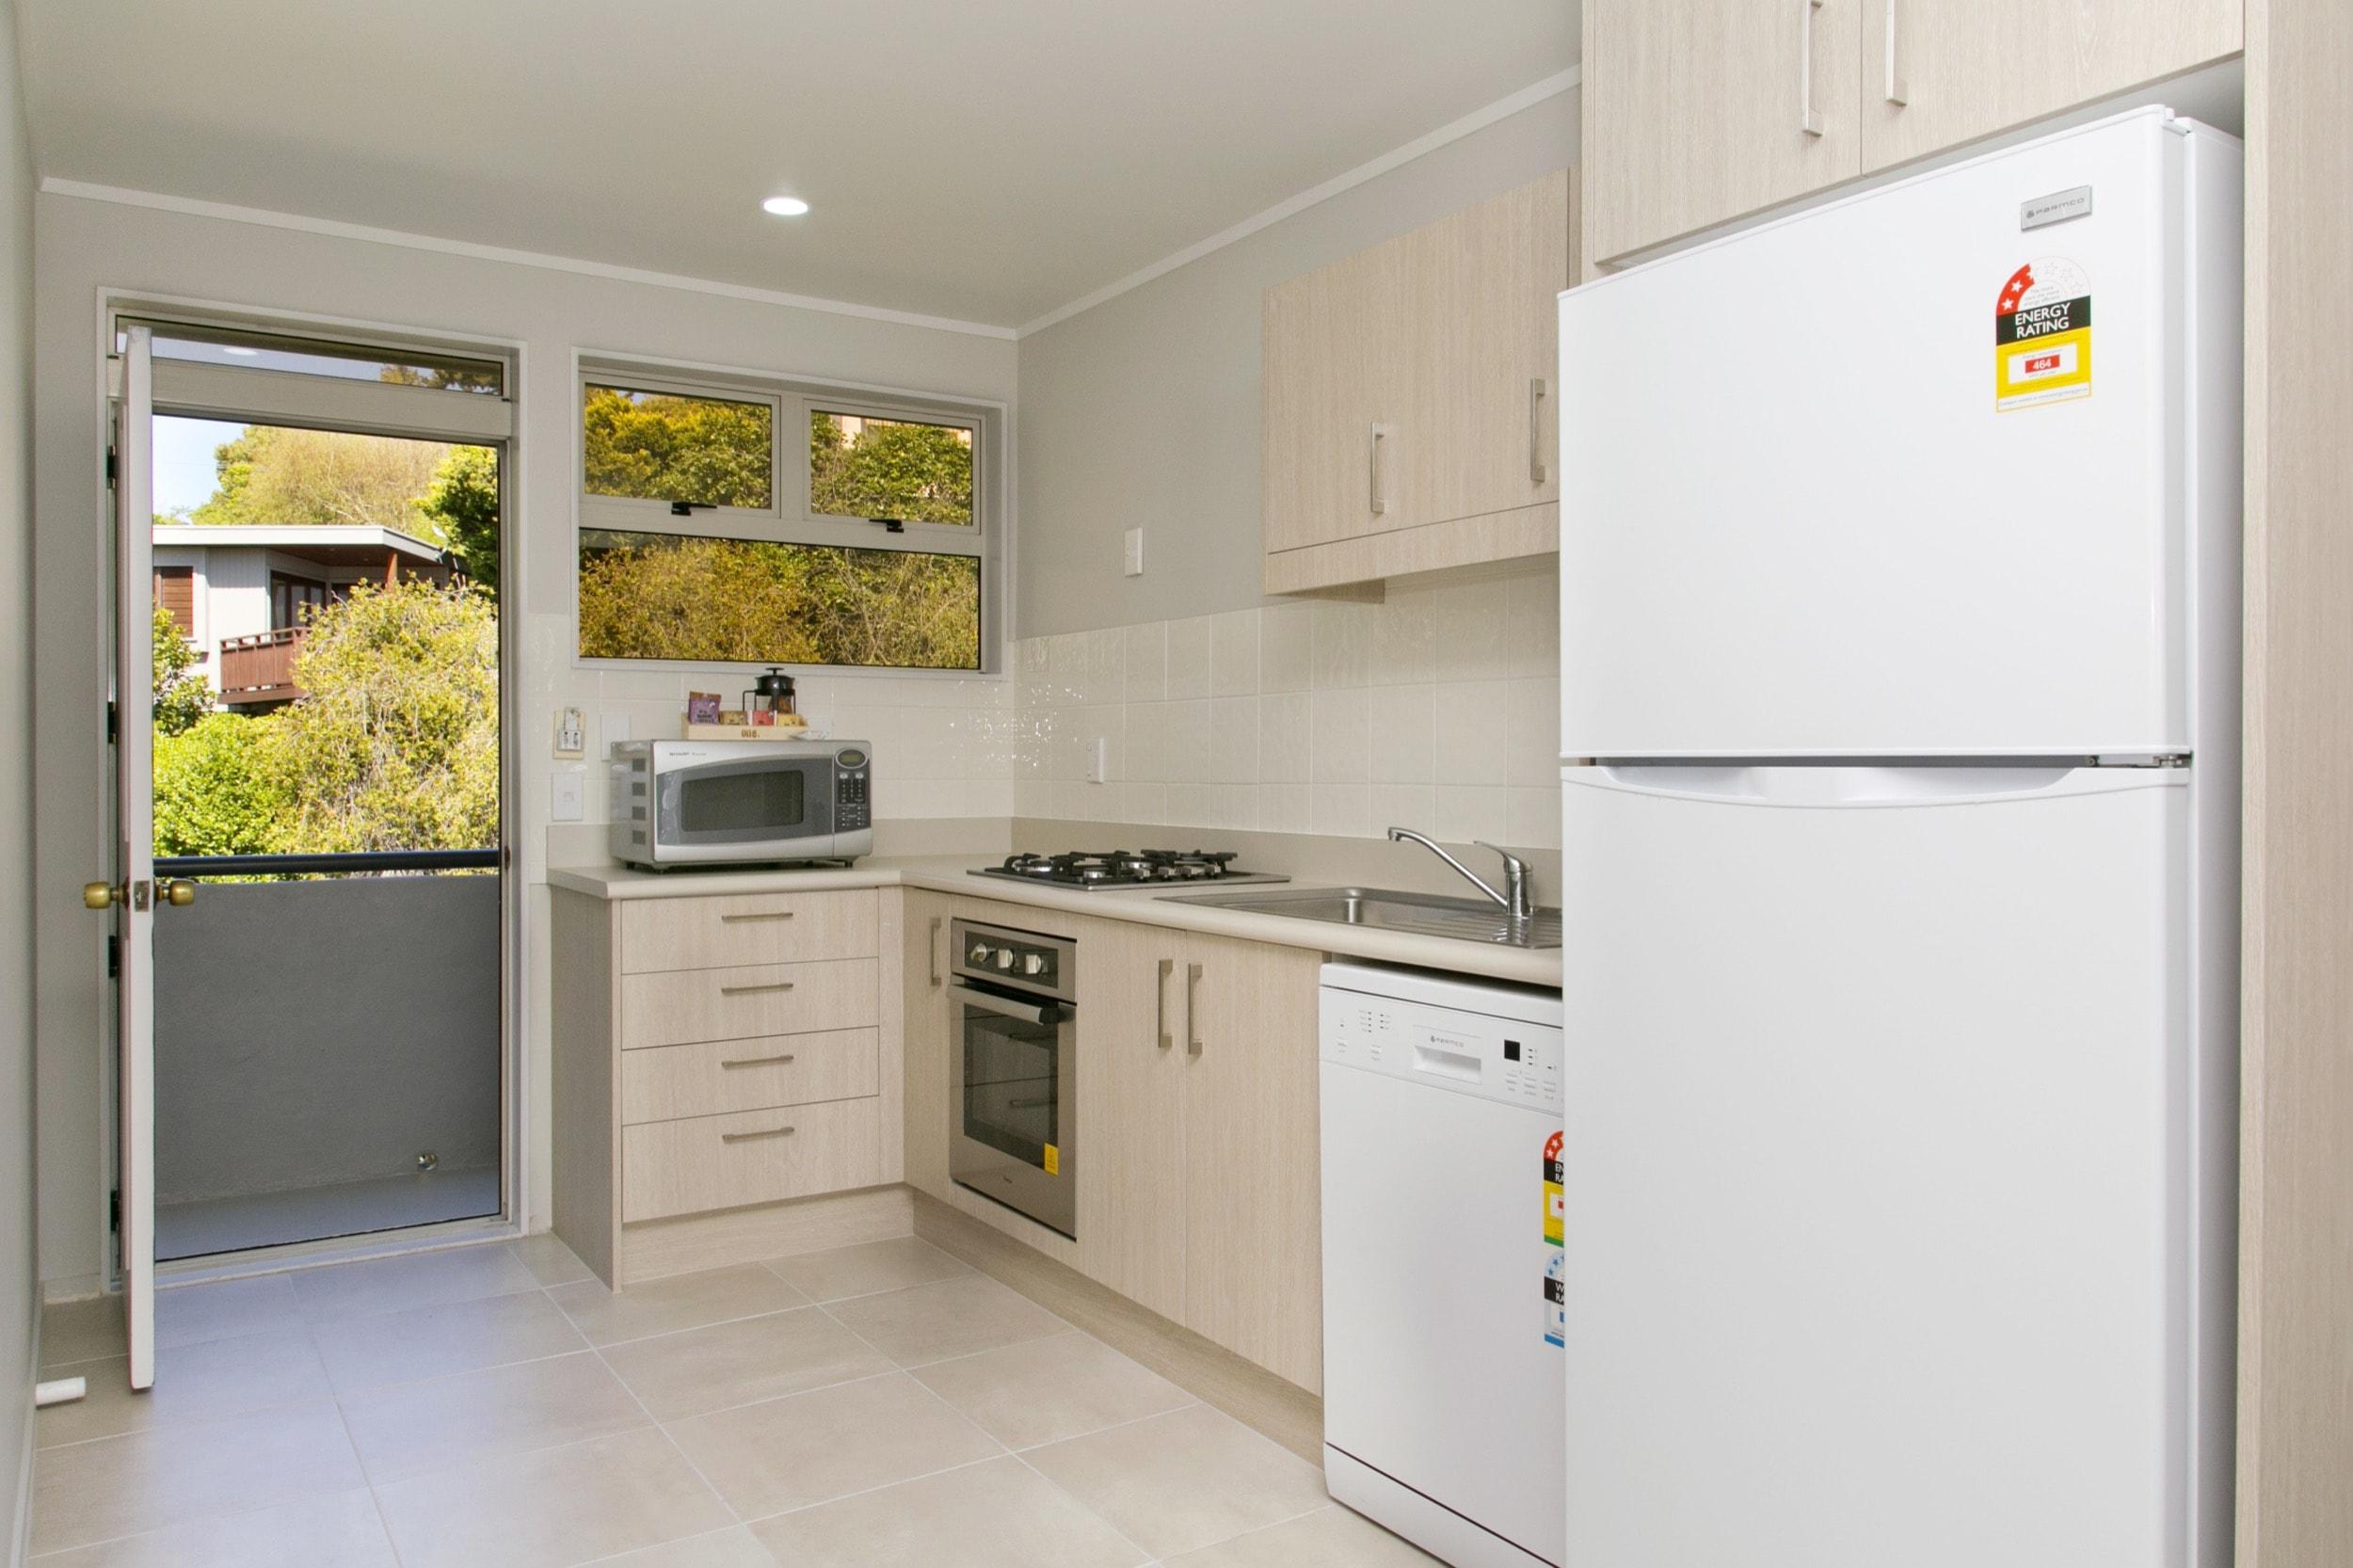 three bedroom kitchen-min.jpg